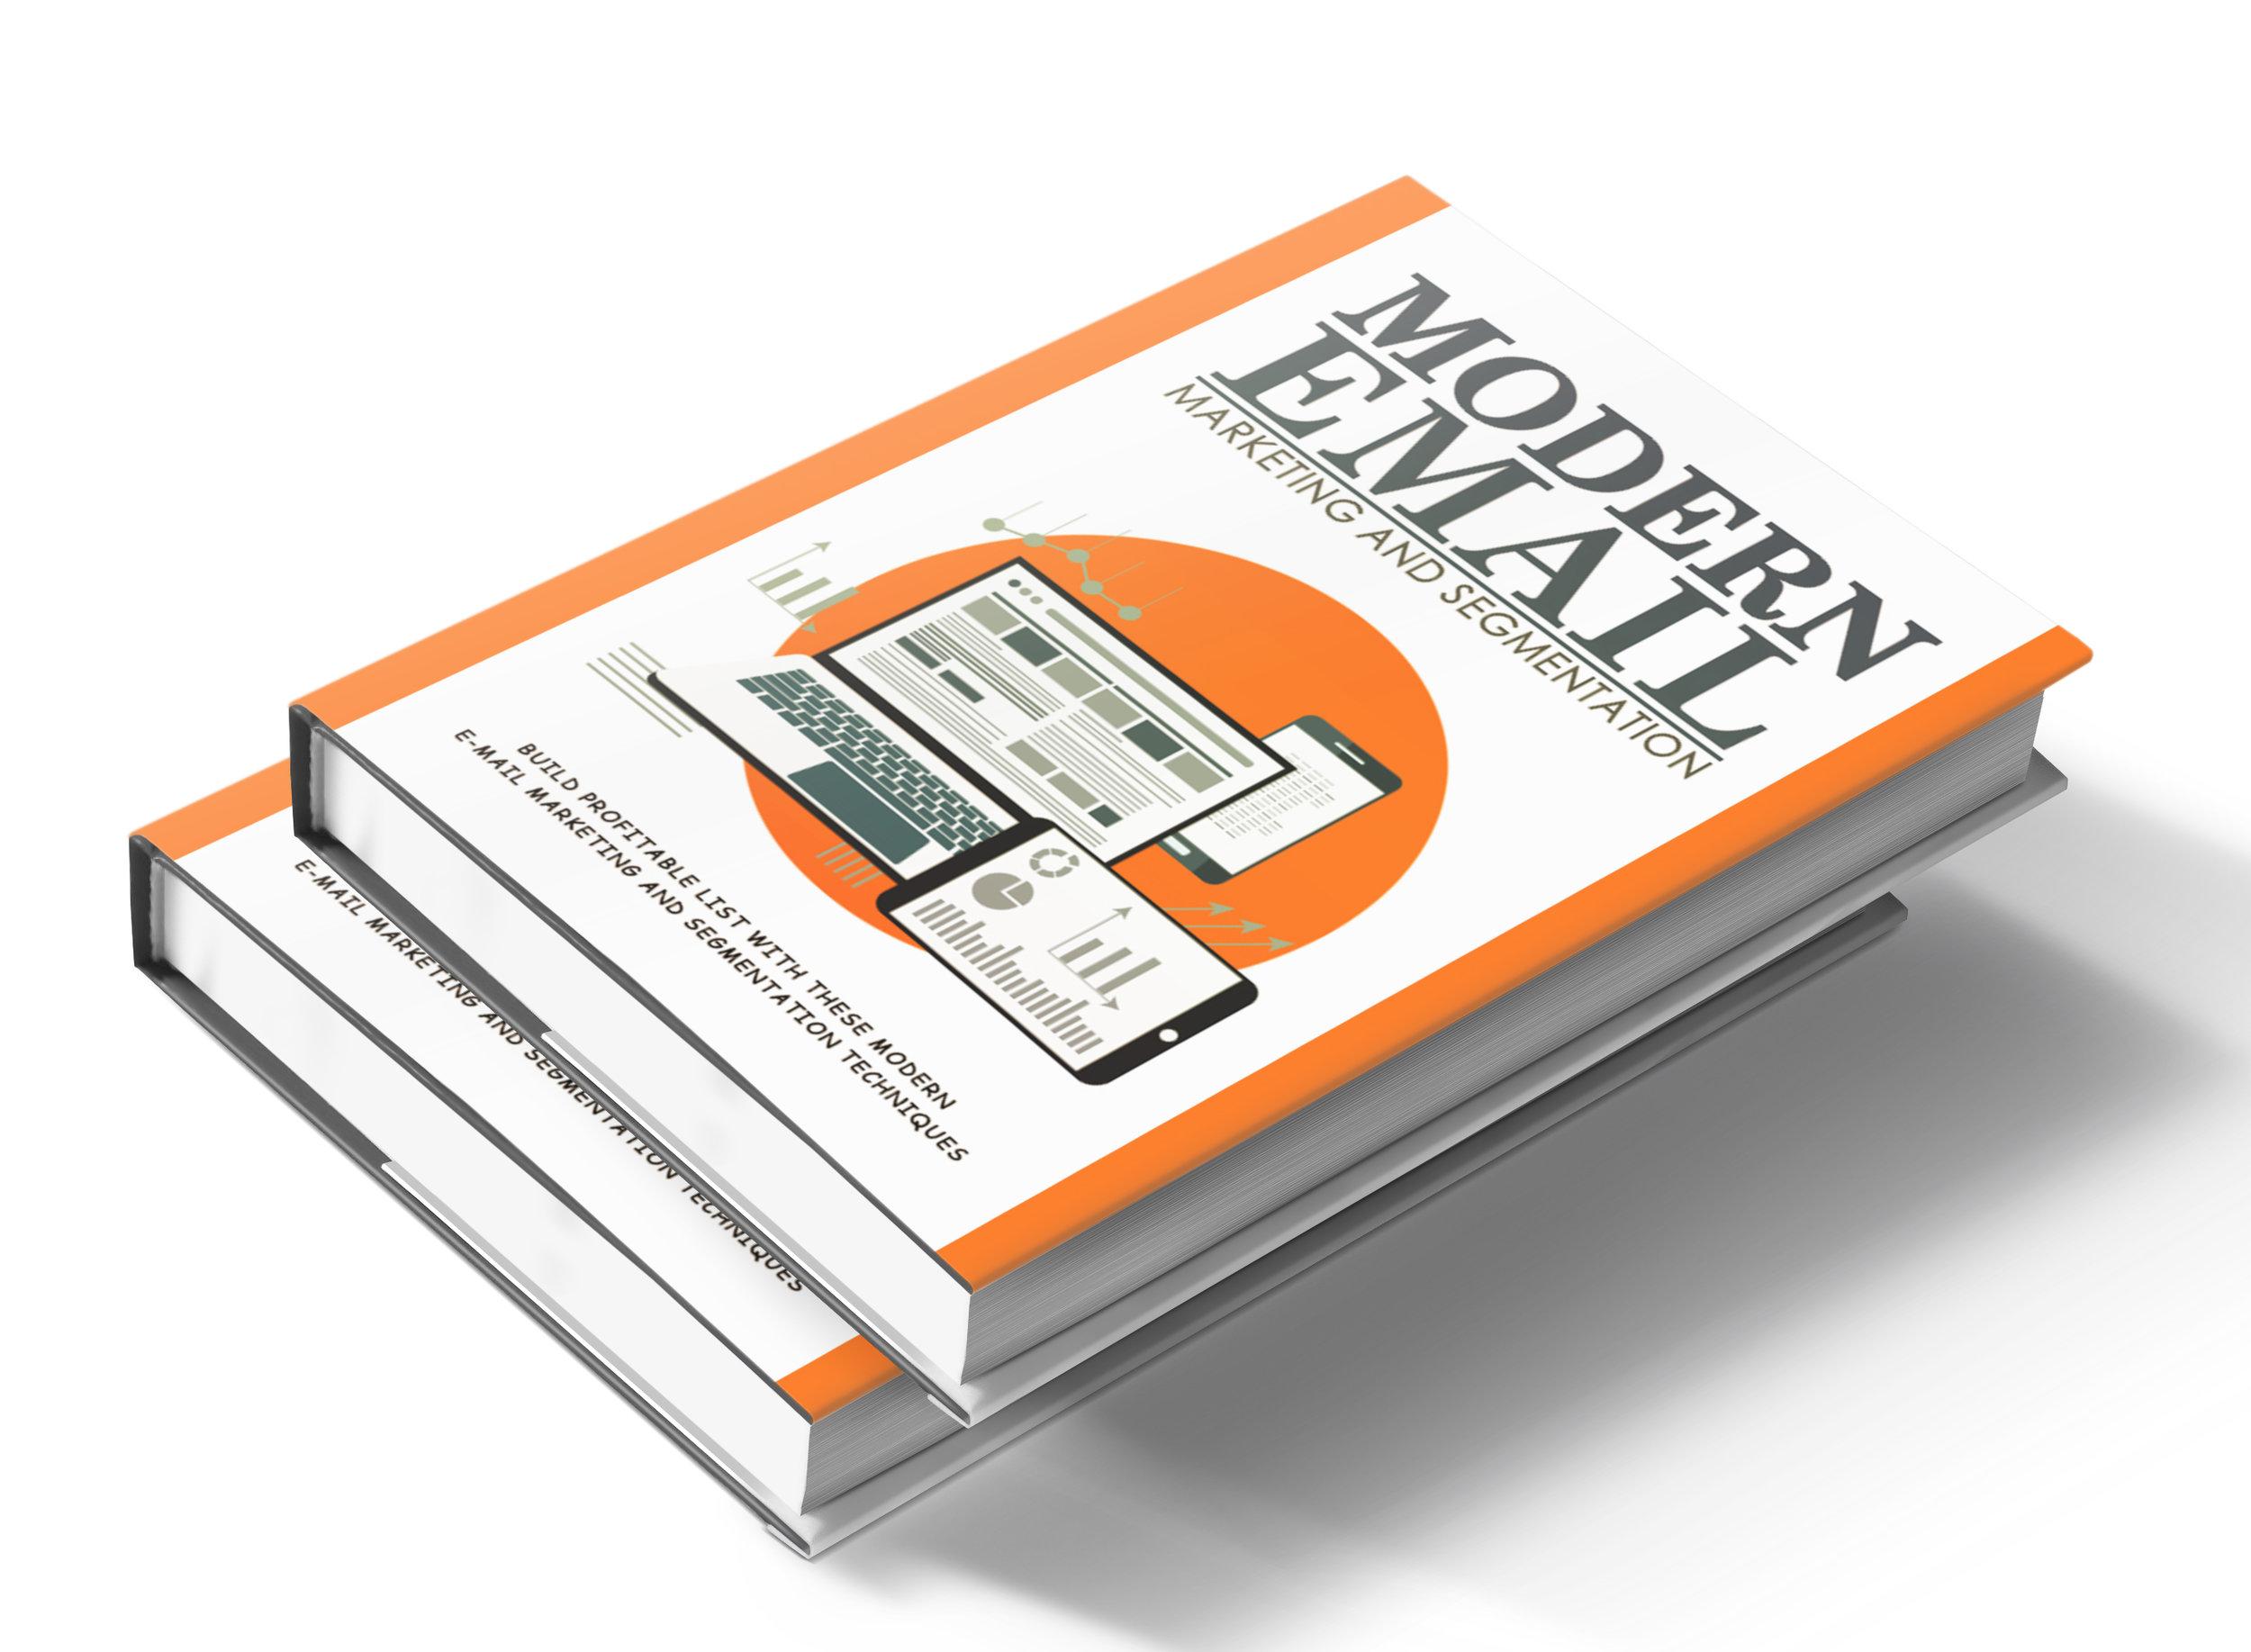 crash-course-modern-email-book.jpg